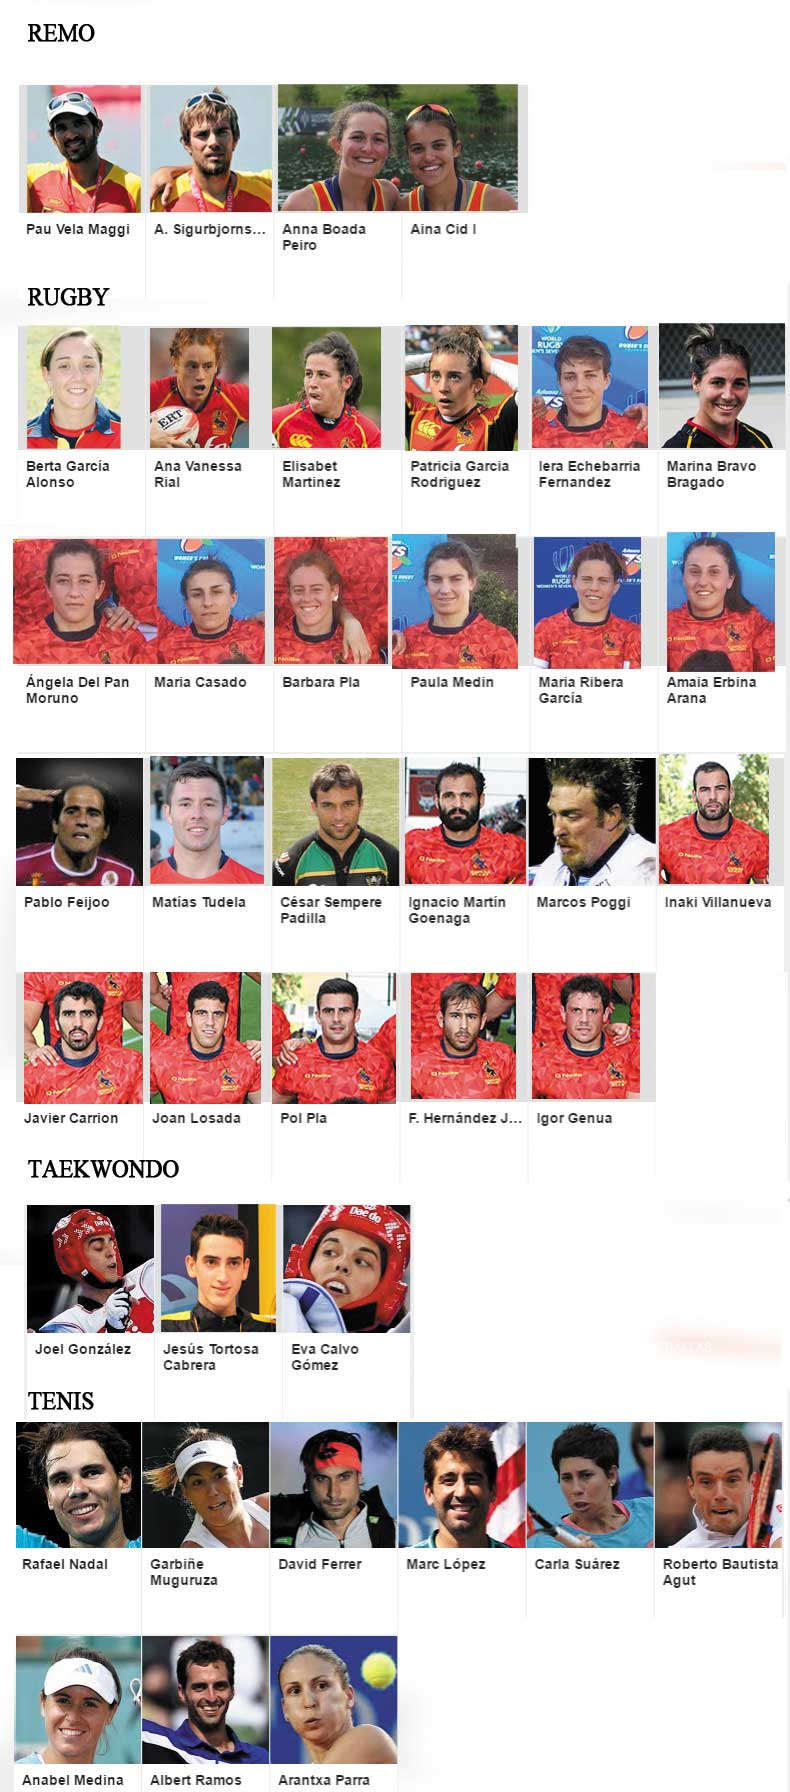 olimpicos-spain-rio-2016-rugby-remo-taekwondo-tenis-avance-deportivo